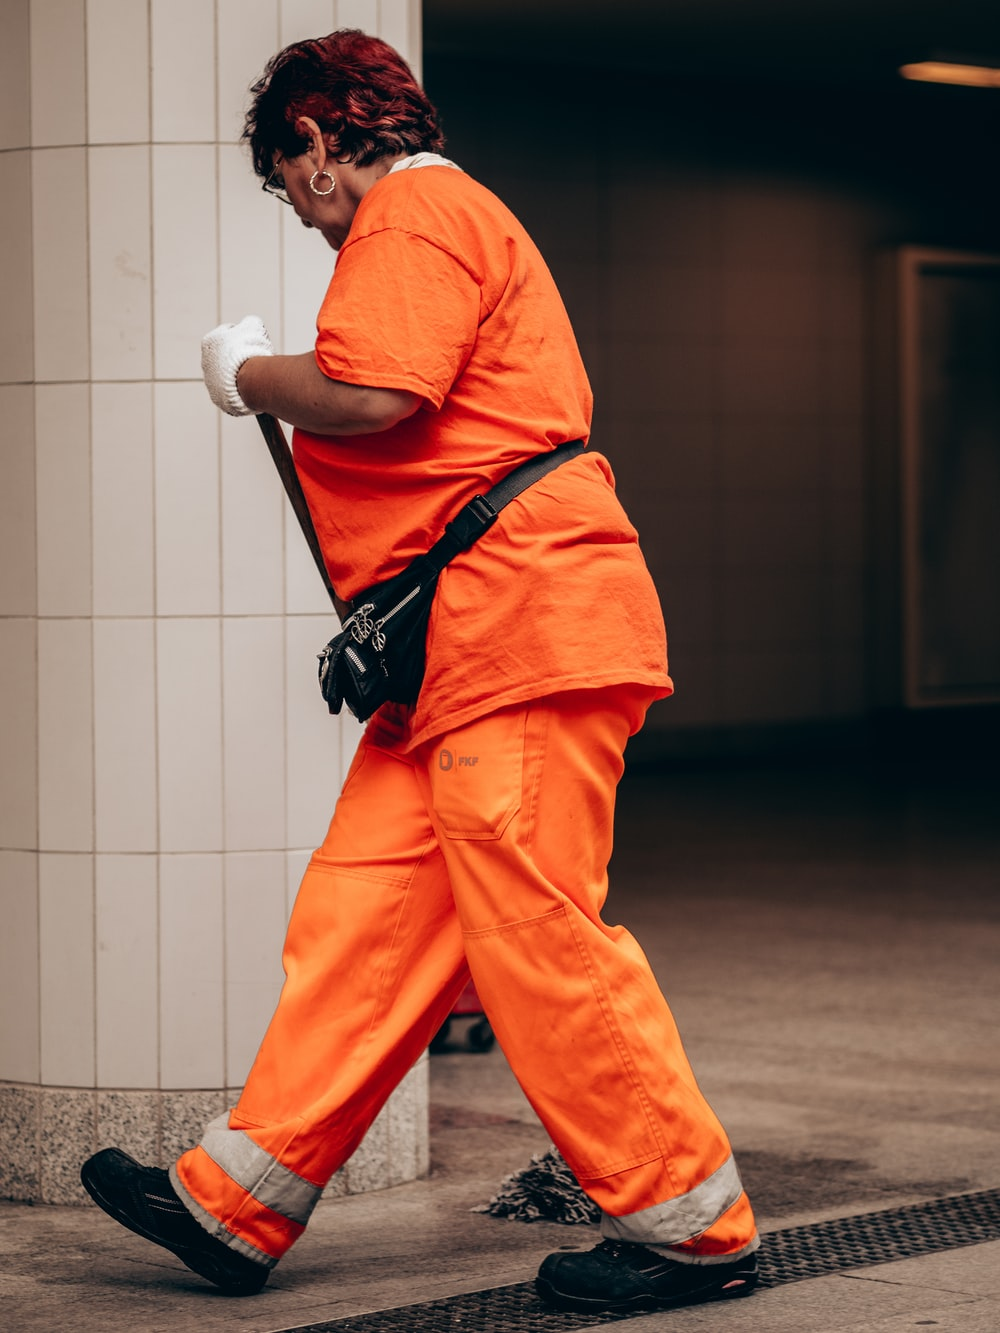 woman wearing orange t-shirt and pants